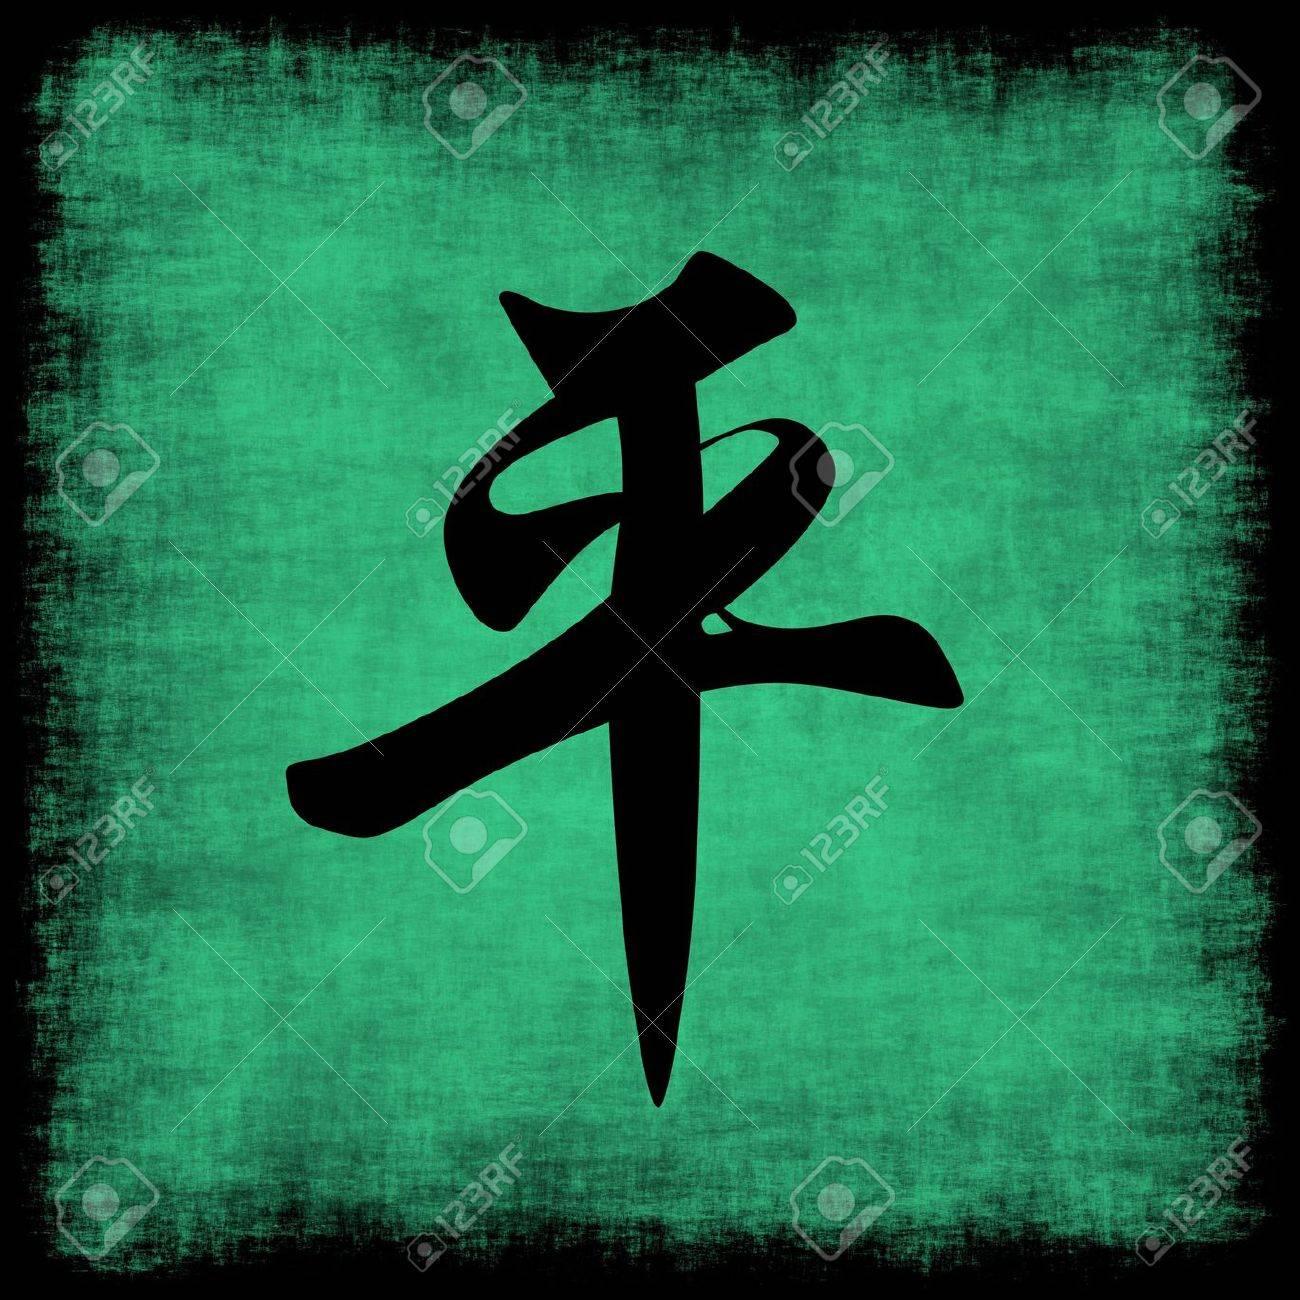 Peace chinese calligraphy symbol grunge background set stock photo peace chinese calligraphy symbol grunge background set stock photo 3820039 buycottarizona Choice Image